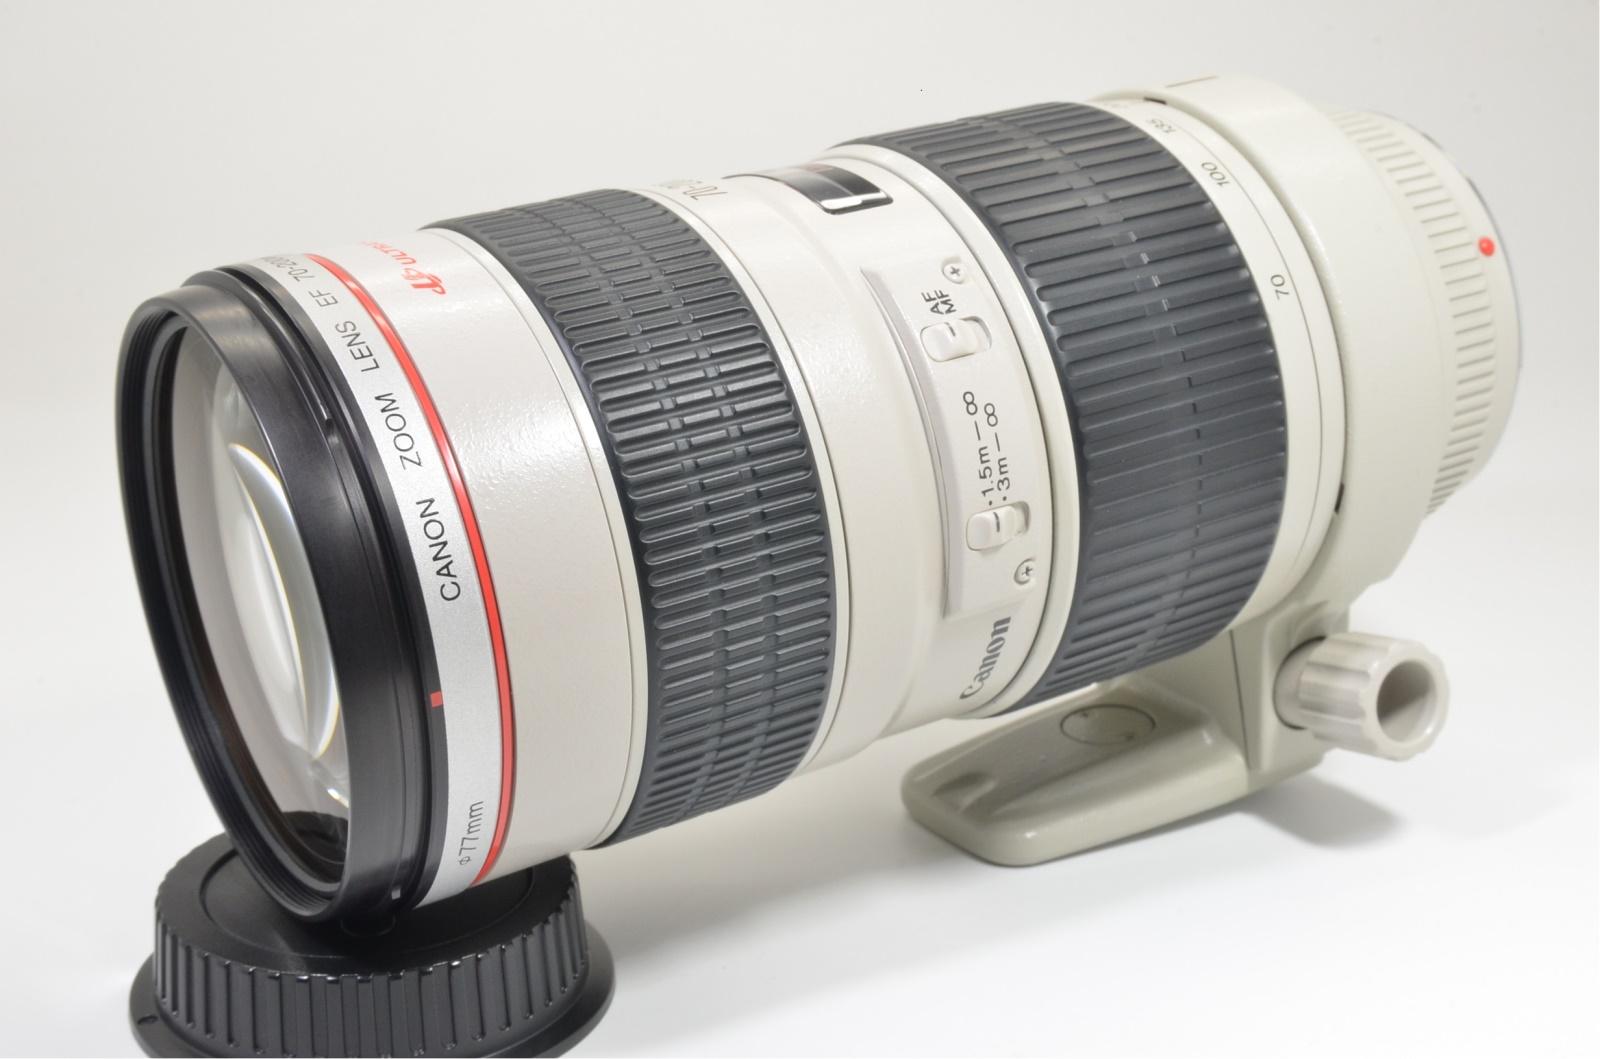 canon ef 70-200mm f/2.8 l usm ultrasonic lens near mint shooting tested